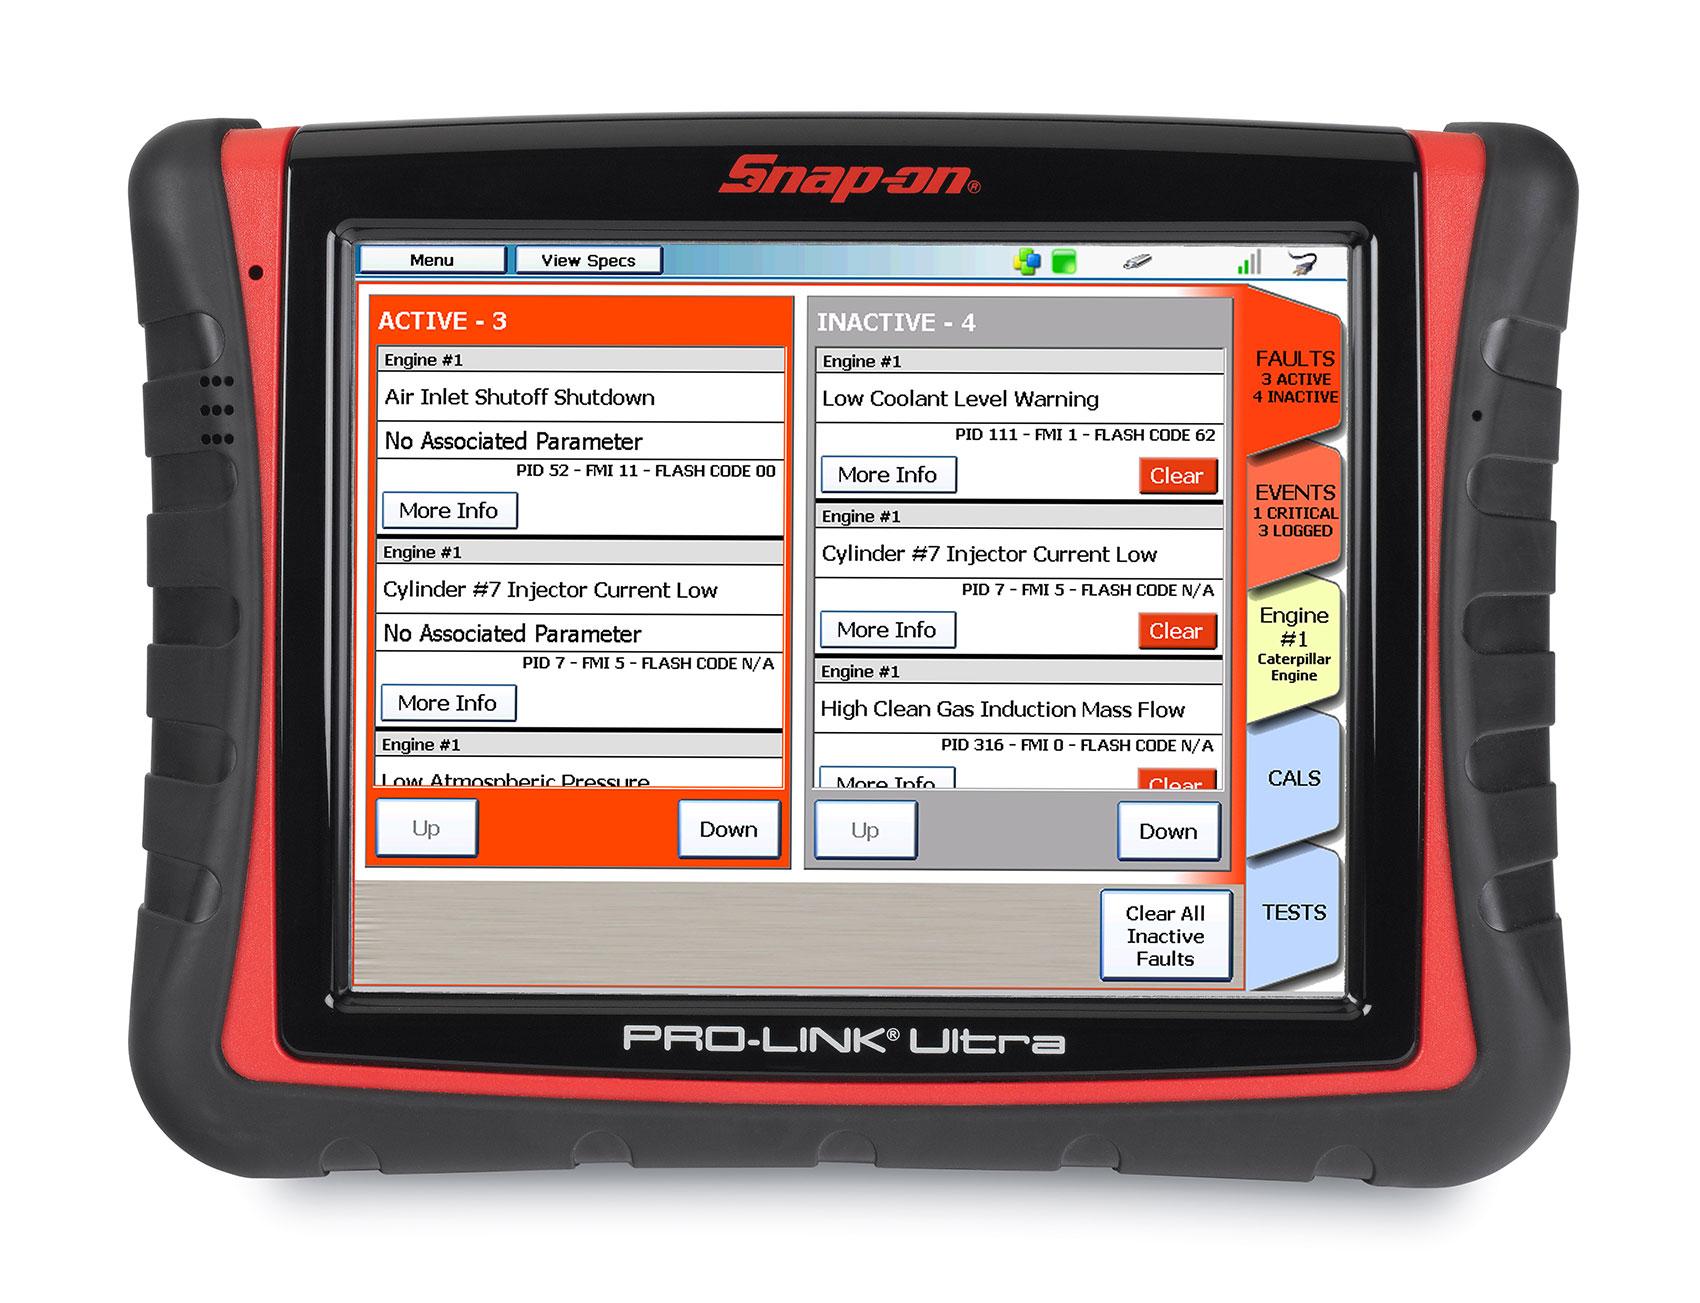 Pro Link Ultra Vehicle Diagnostic Tool Snap On Diagnostics